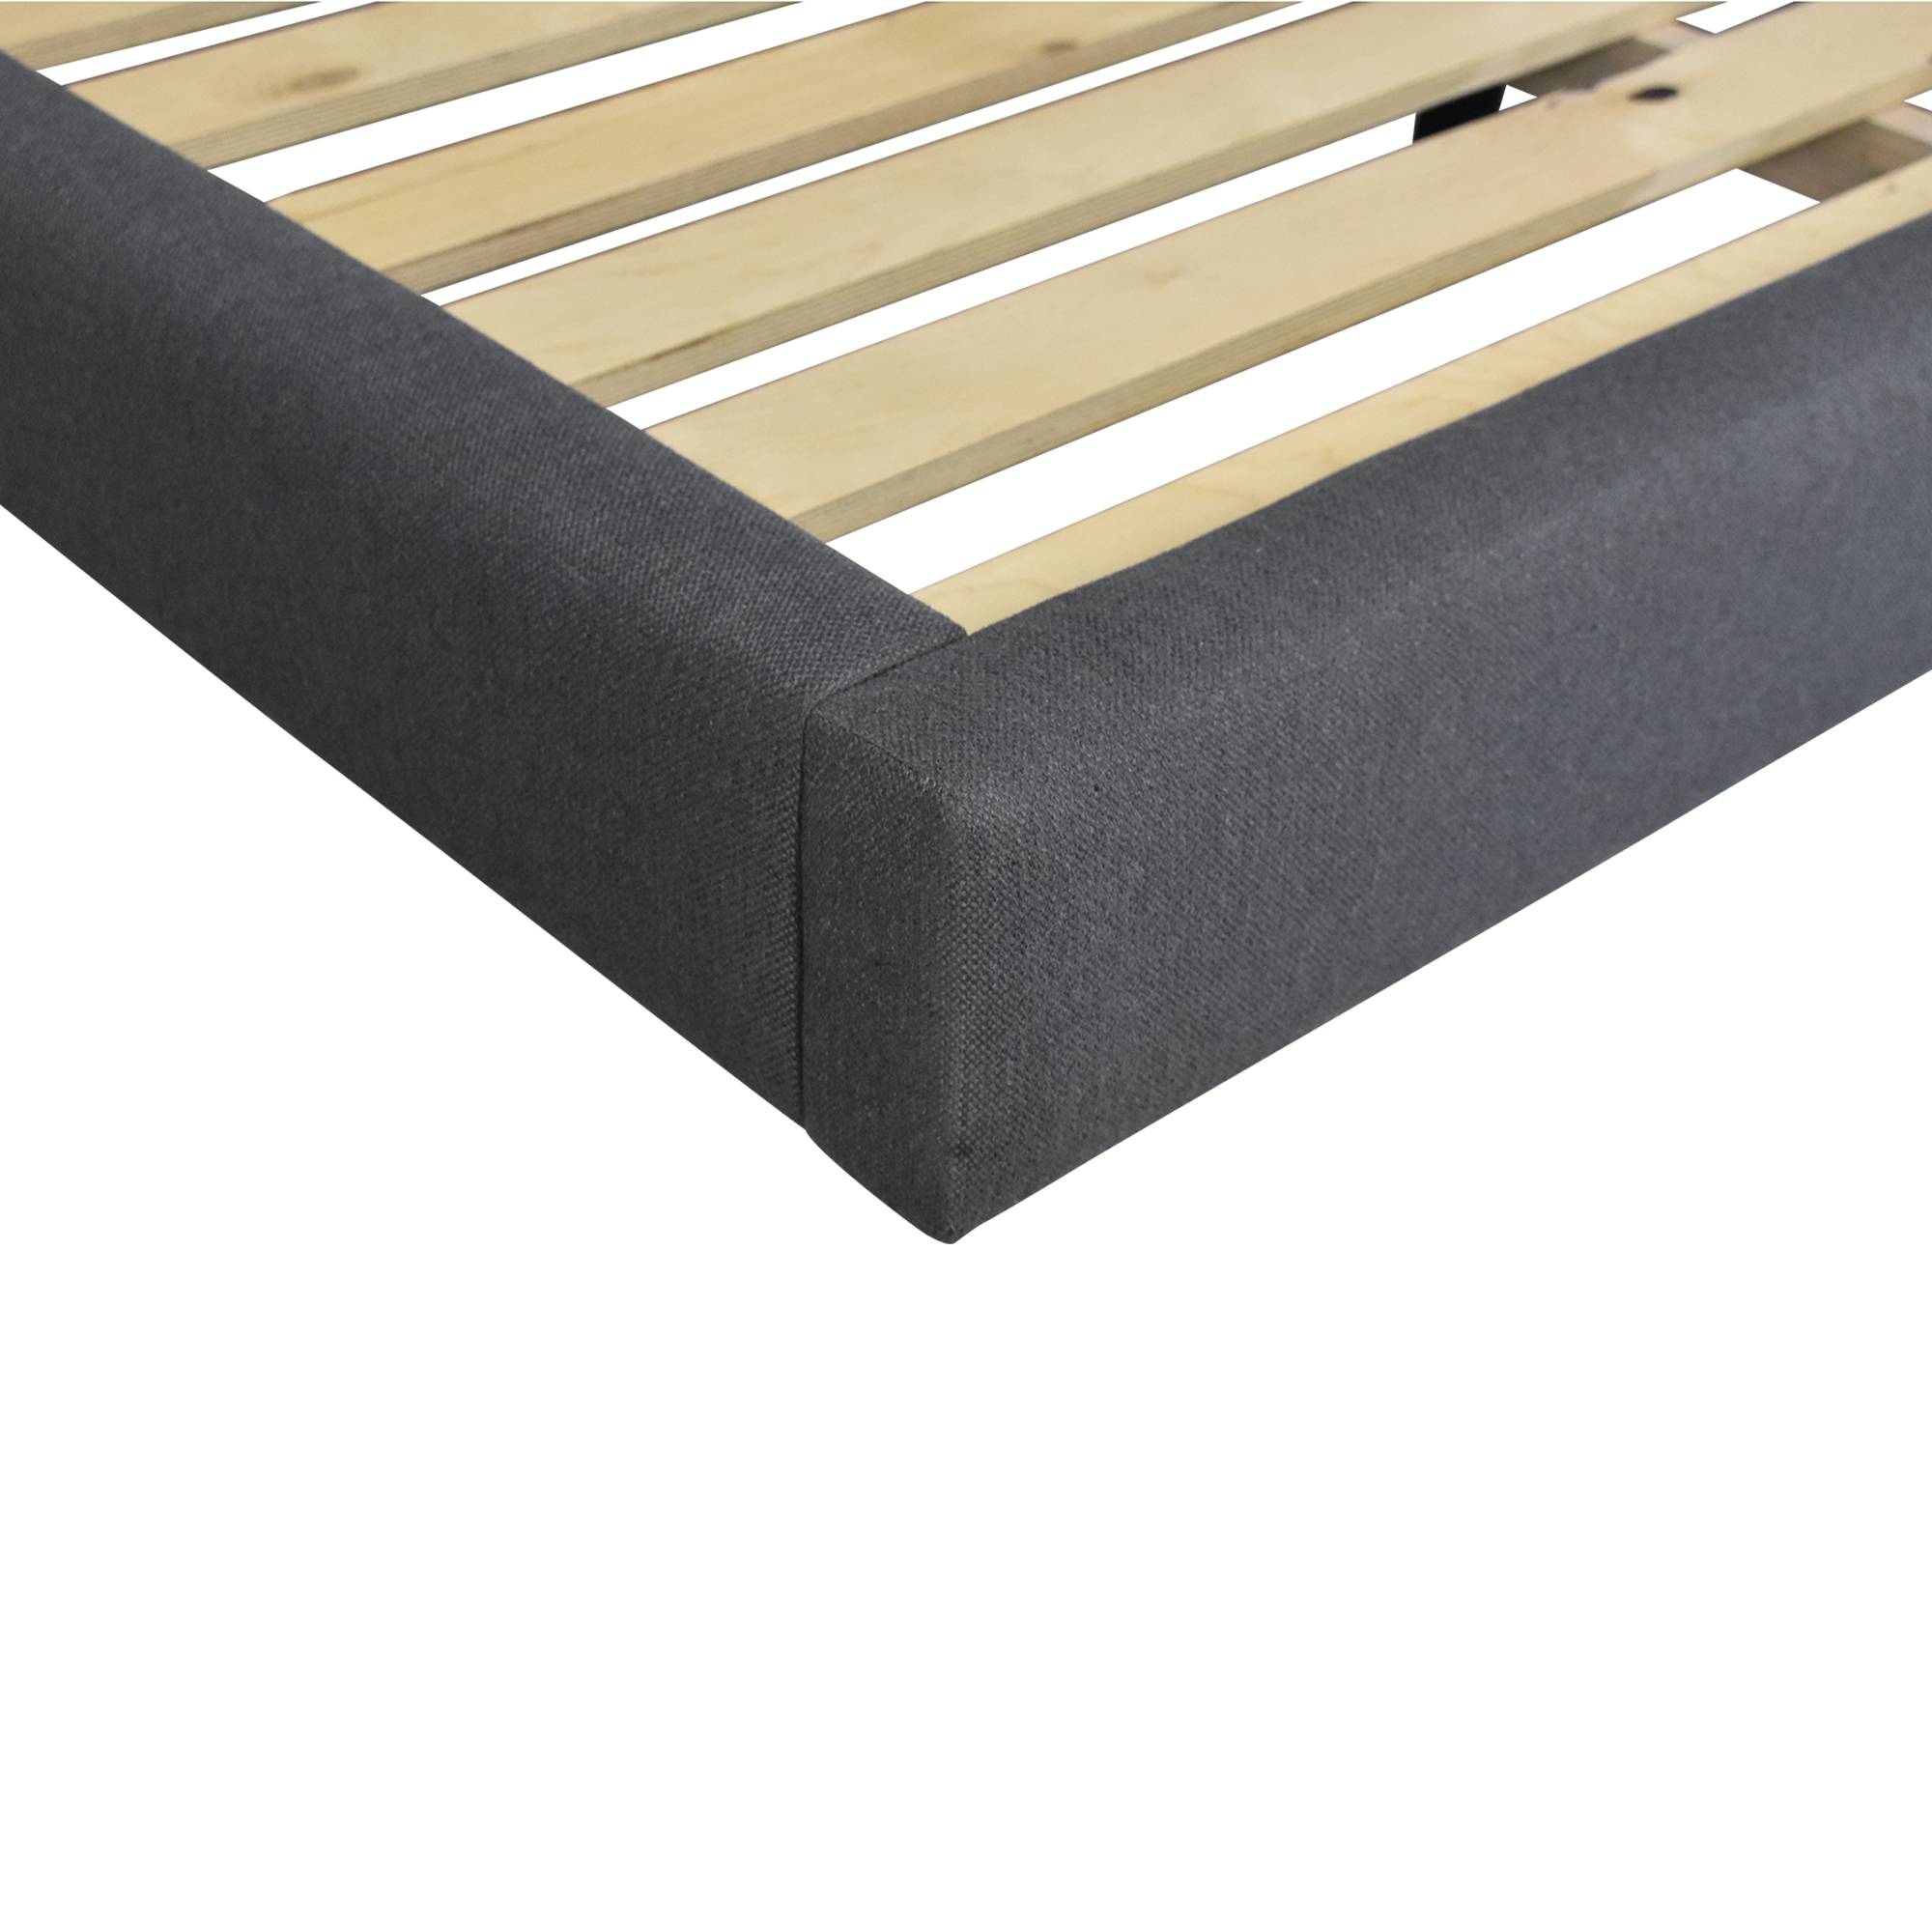 Crate & Barrel Crate & Barrel Tate Queen Bed nyc